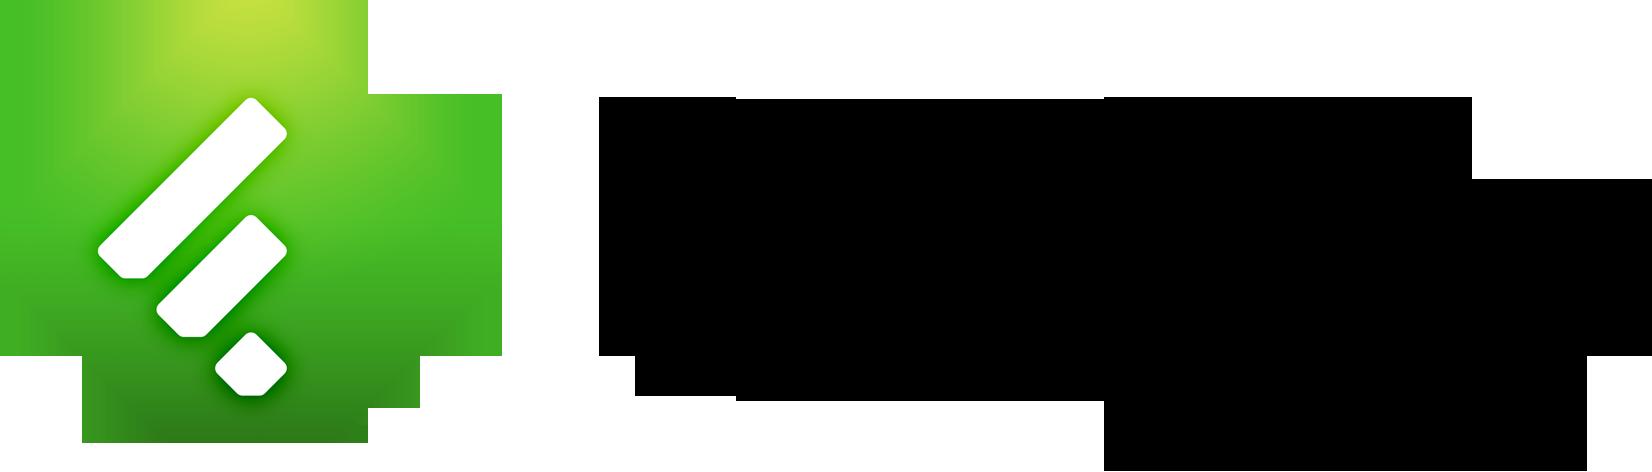 Feedly Logo.